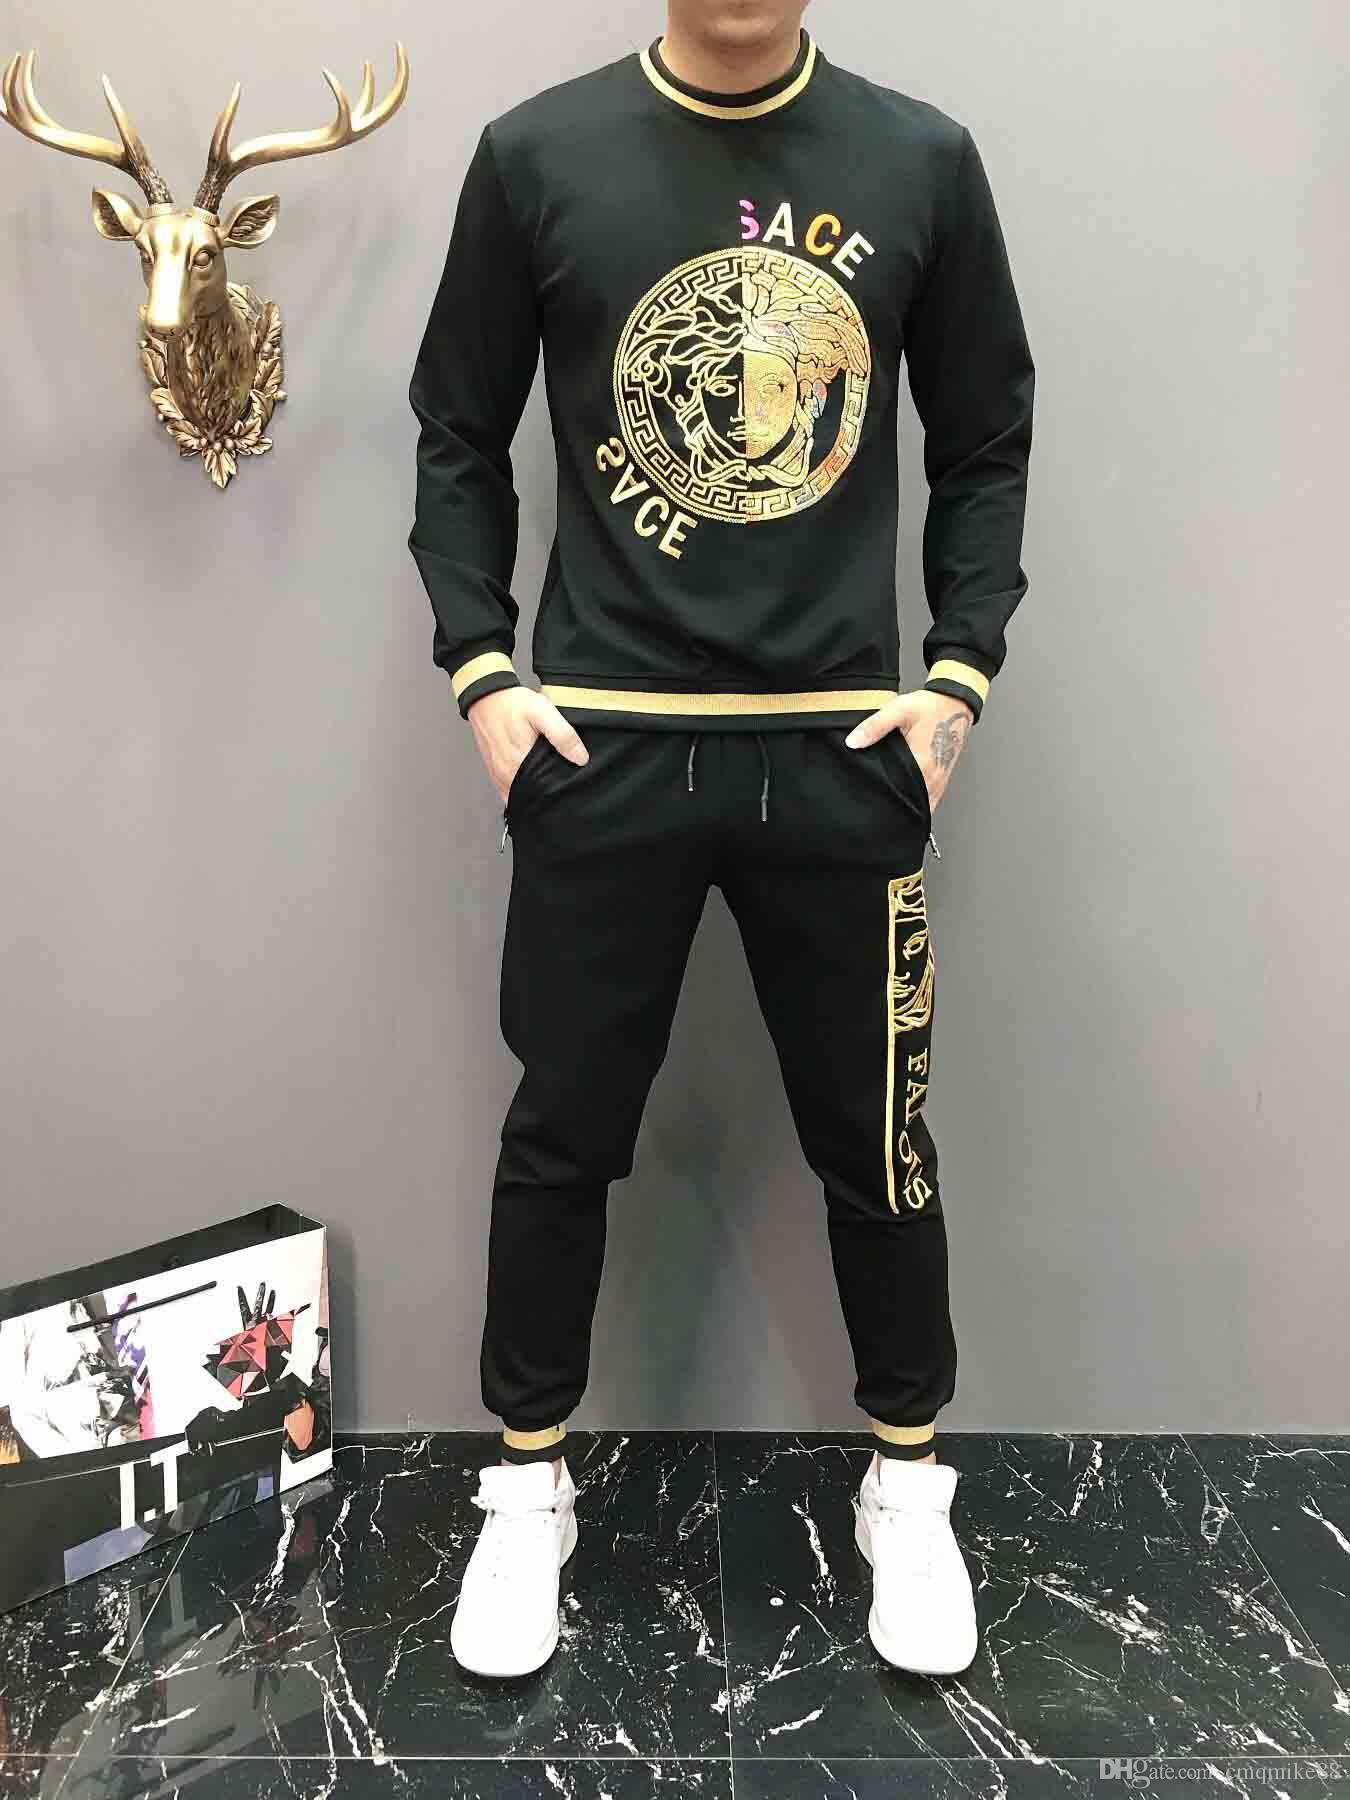 Neue Winter-Trainingsanzug Männer Luxus Sweat Anzüge Herbst Markemens Jogger Anzüge Jacke Hosen Sets Sport Frauenanzuege Hip Hop Sets M-3XL